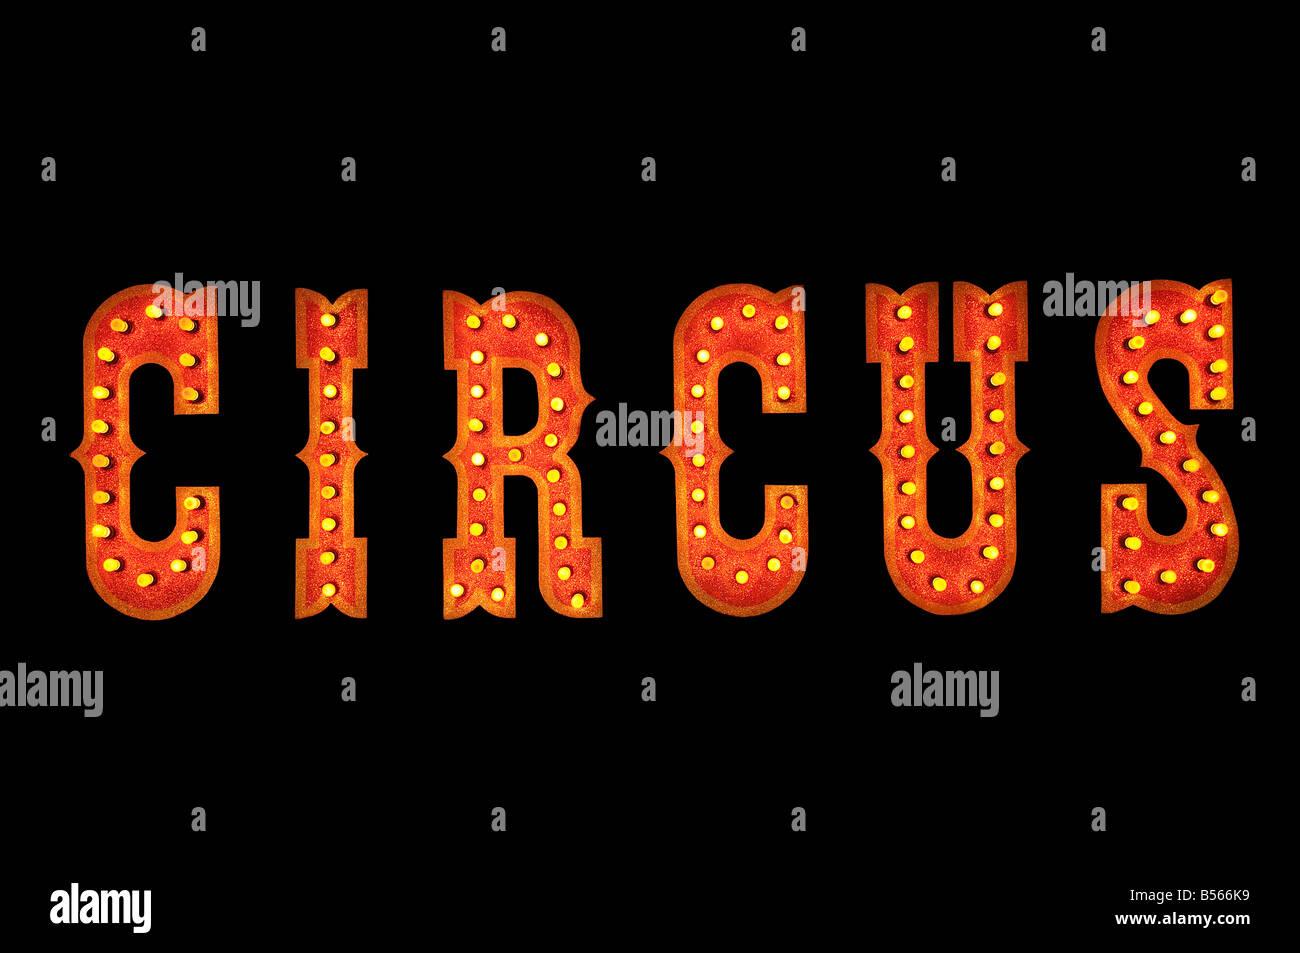 Circus sign - Stock Image